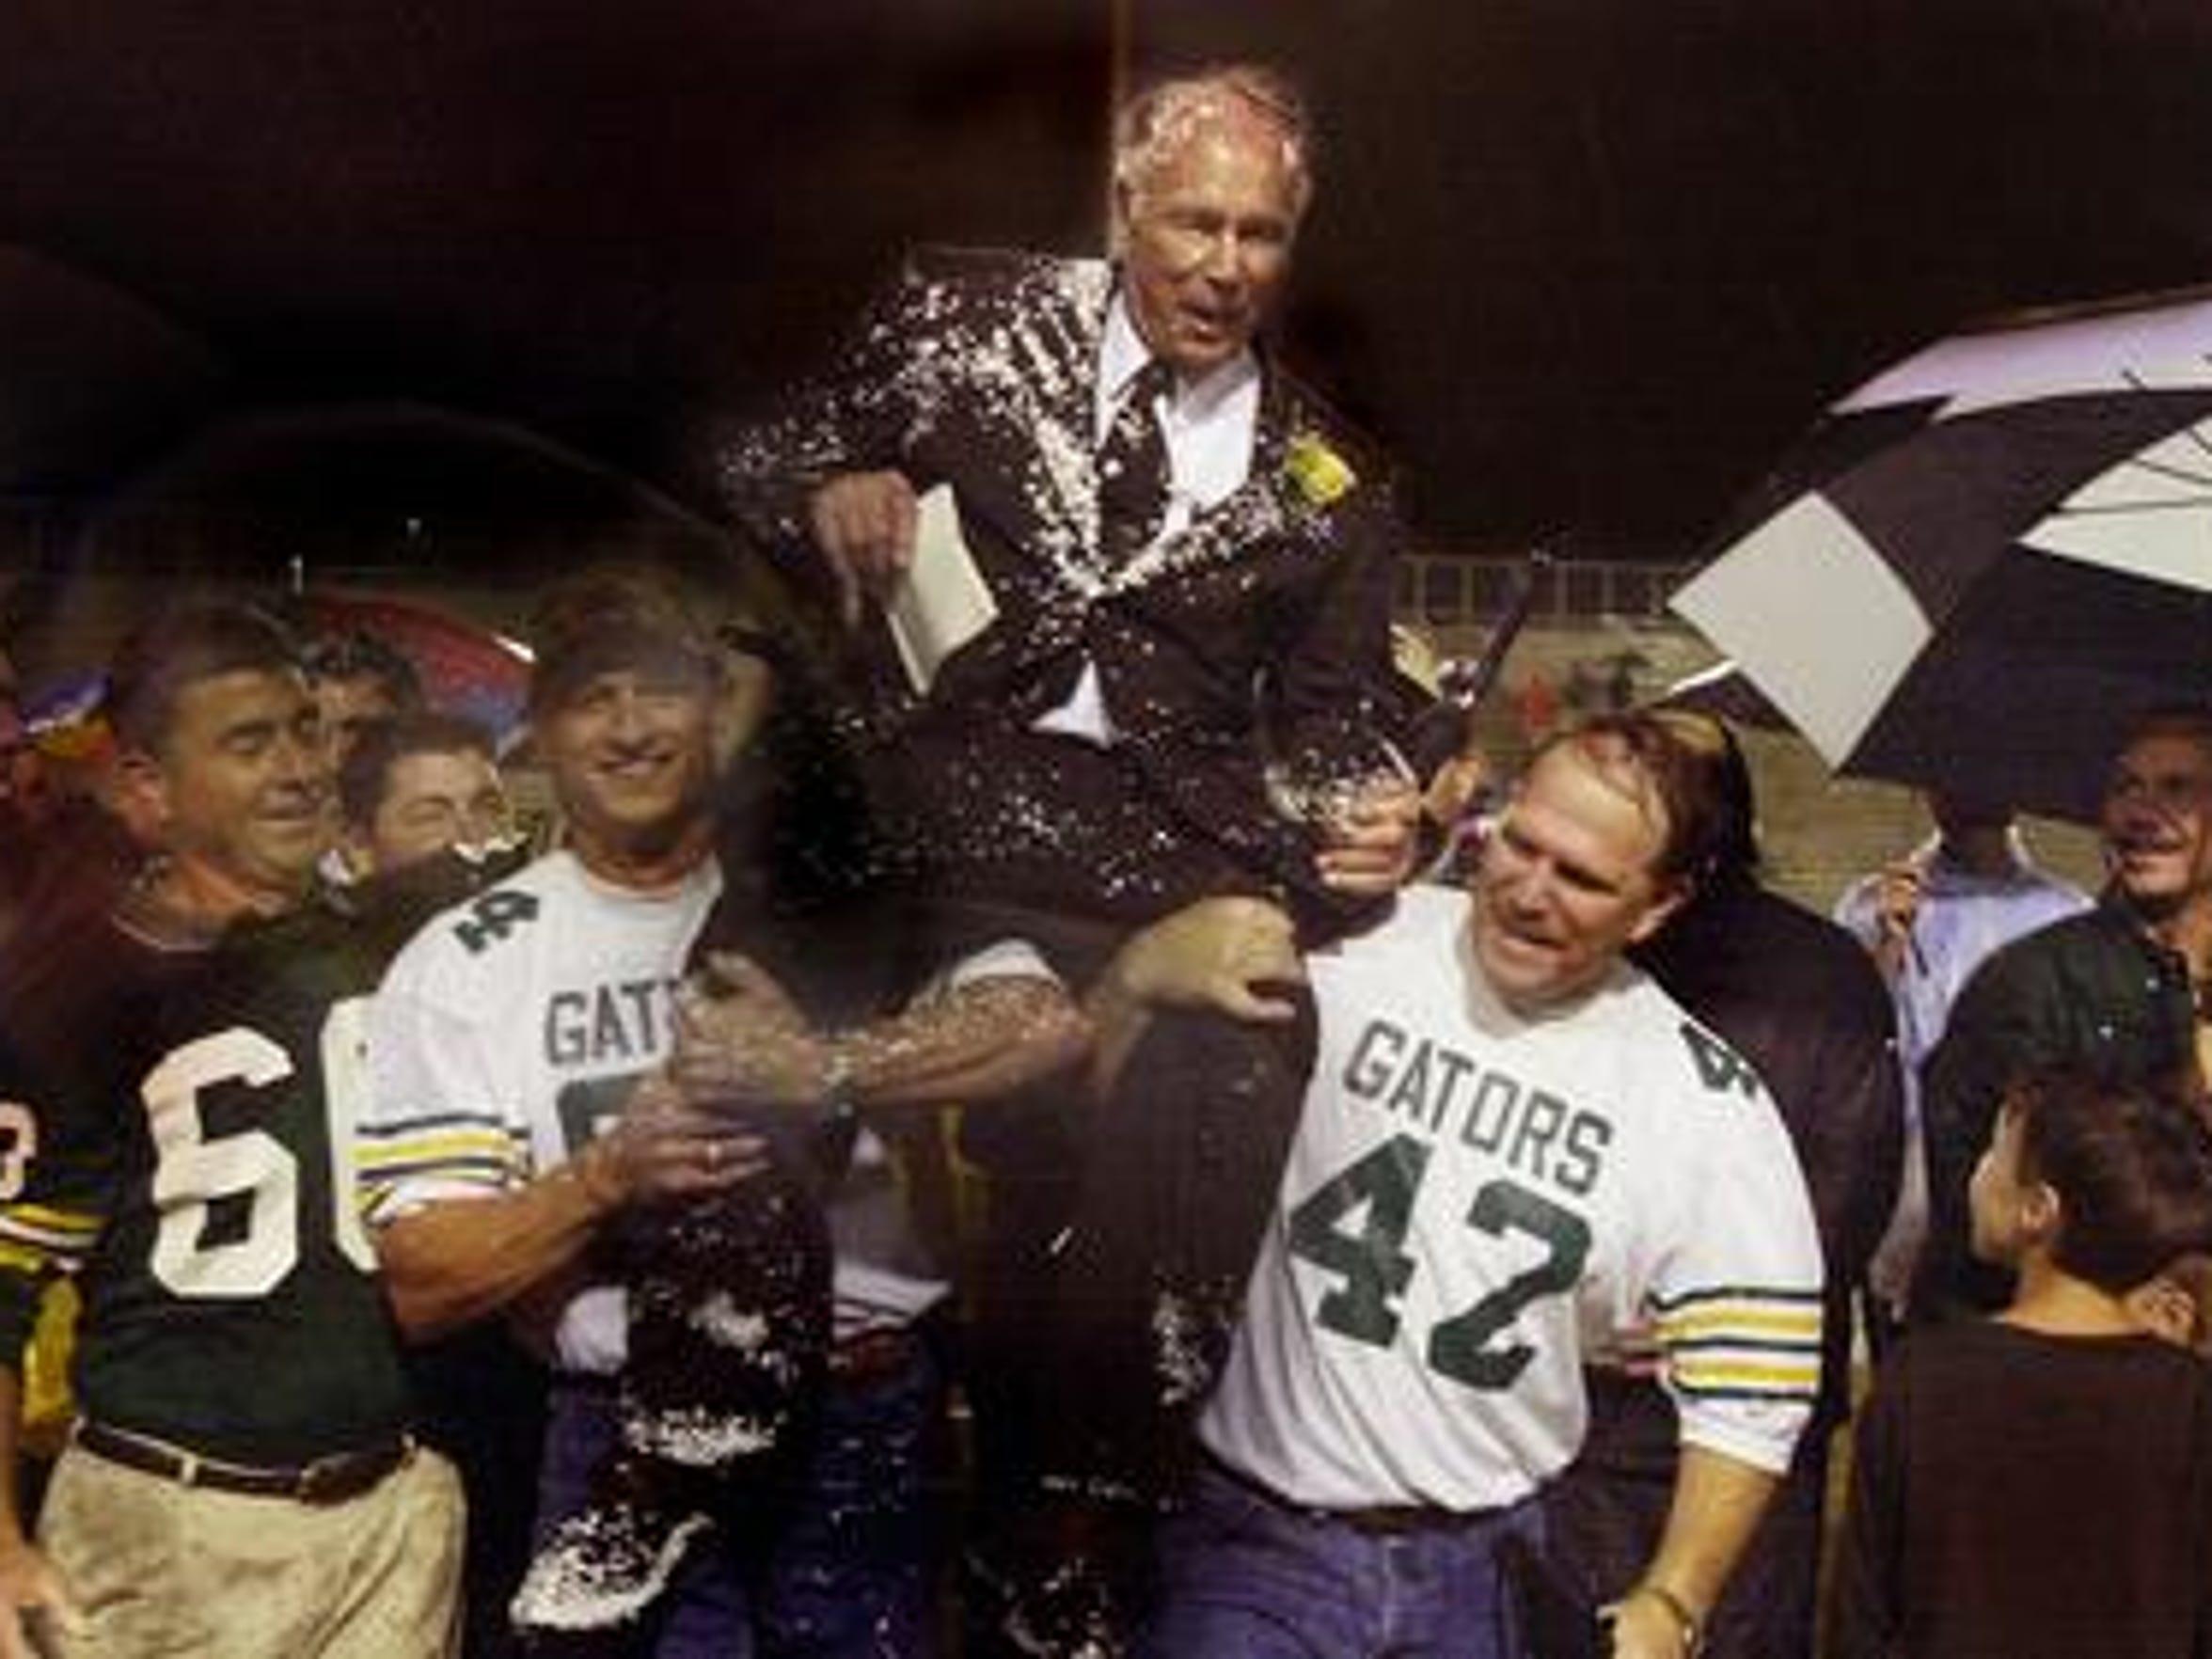 Former Captain Shreve football players Randy Maffett